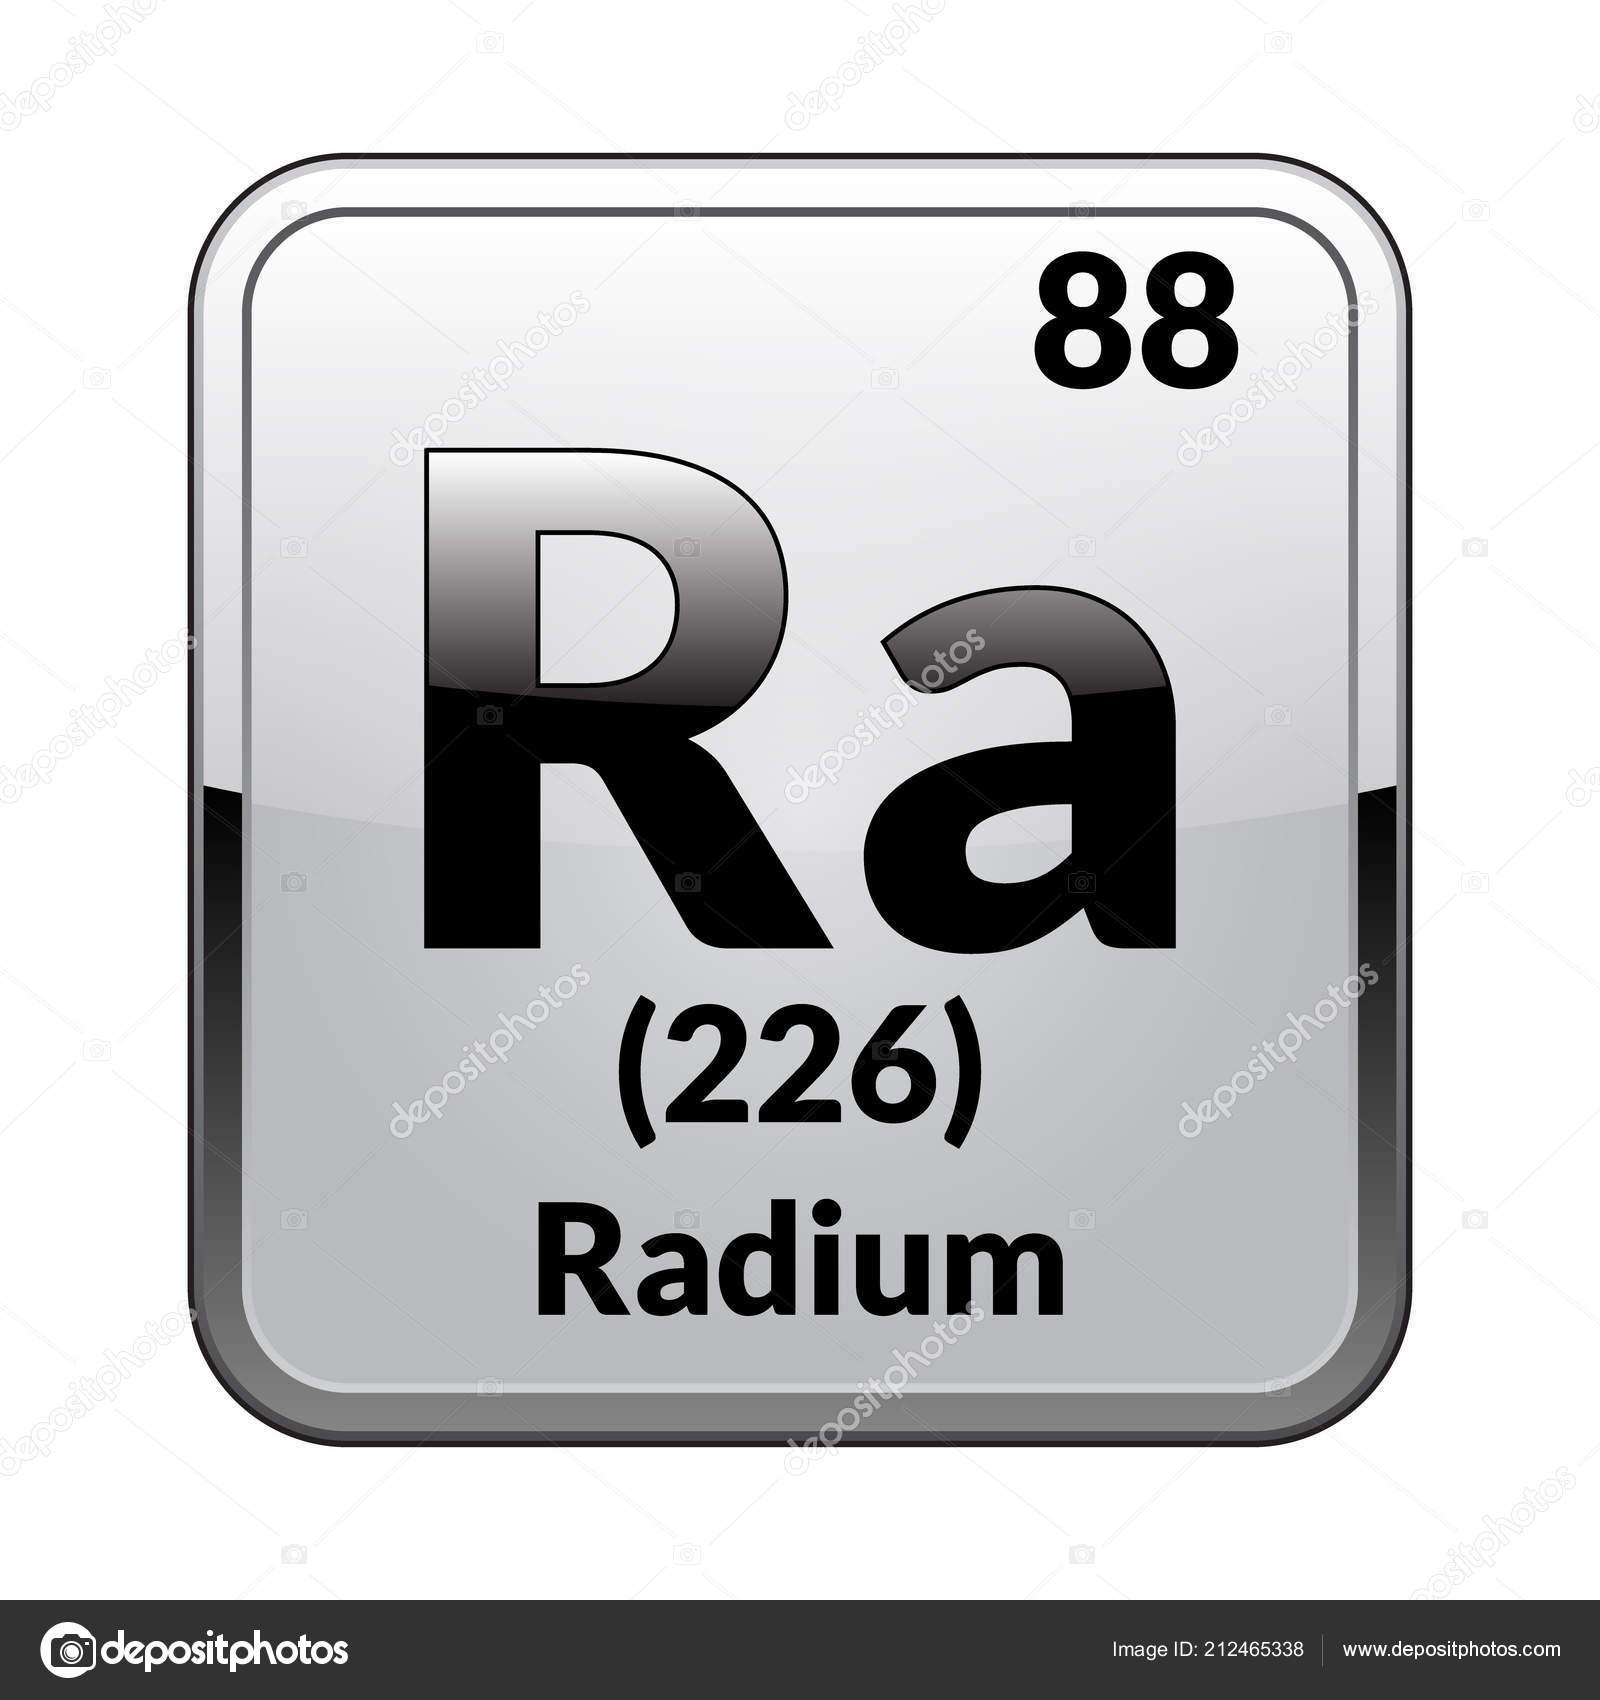 Radium Symbol Chemical Element Periodic Table Glossy White